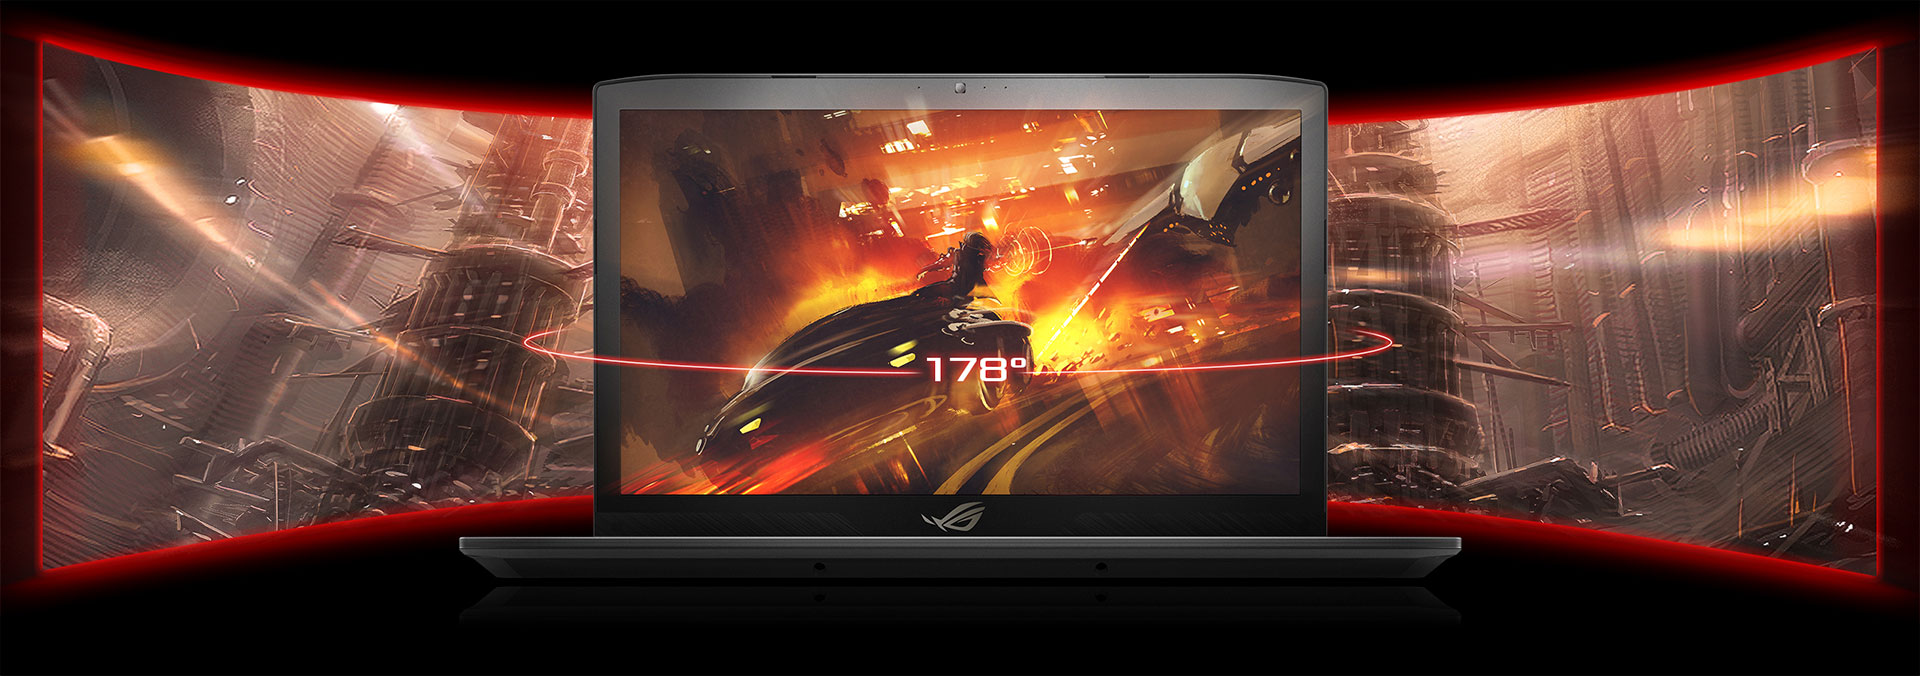 Asus ROG Strix GL703 pantalla